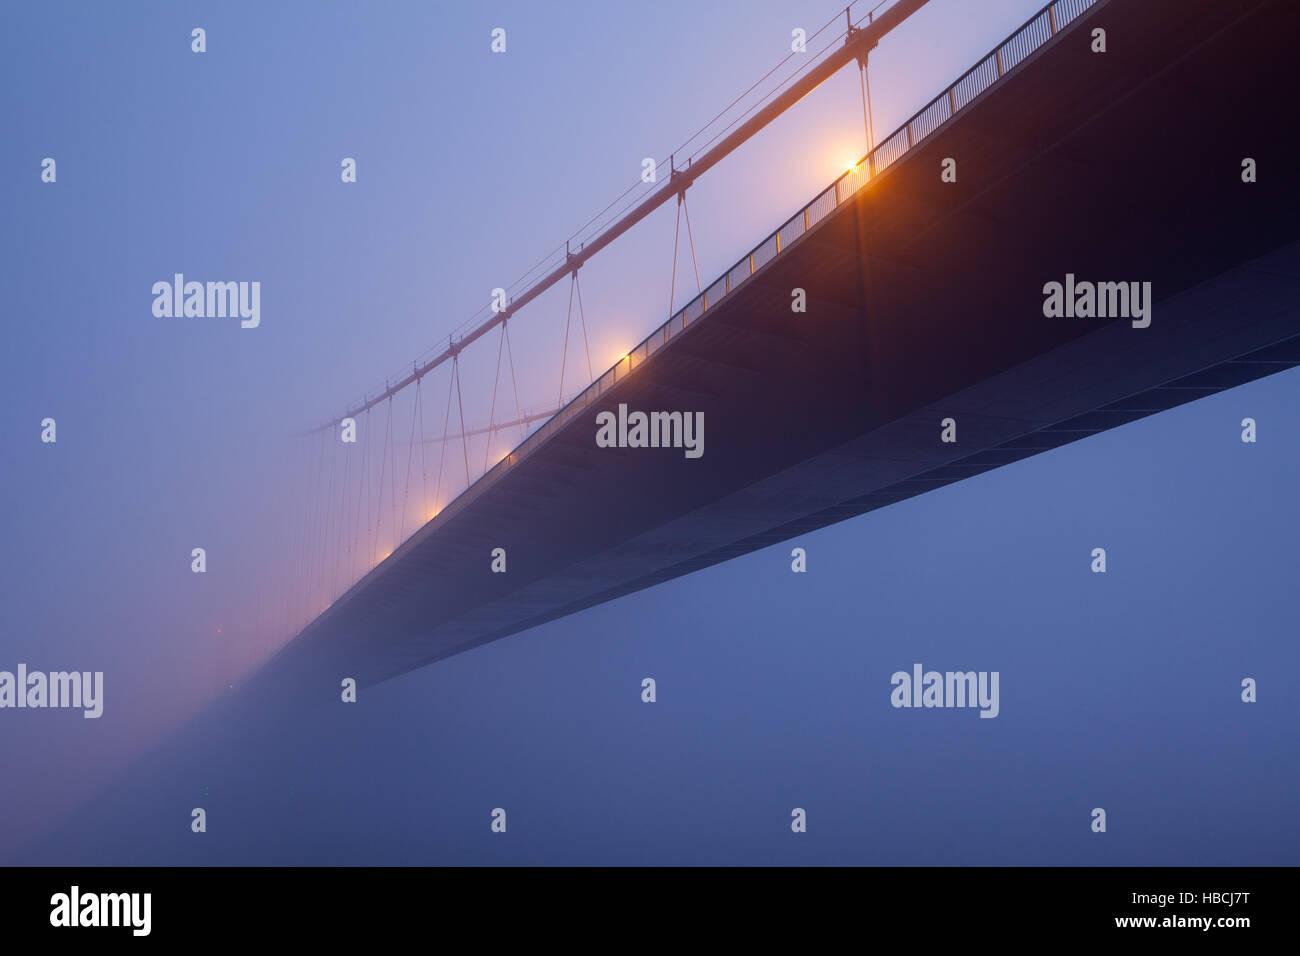 Barton-upon-Humber, North Lincolnshire, UK. 6. Dezember 2016. UK-Wetter. Die Humber Bridge eingehüllt in Morgennebel Stockbild